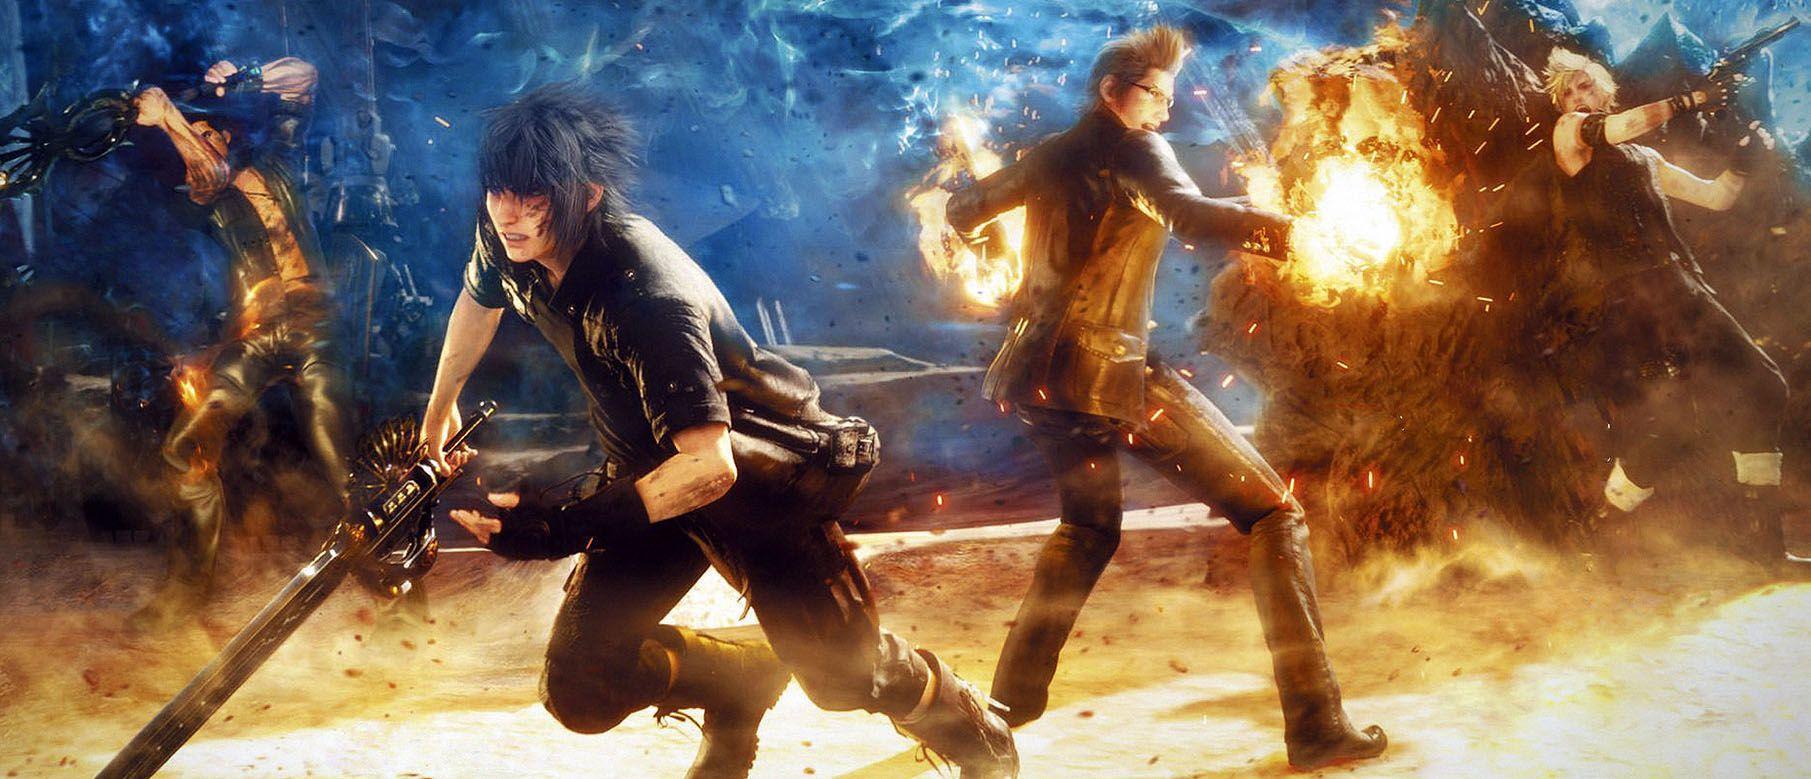 Final Fantasy XV Wallpapers - Wallpaper Cave